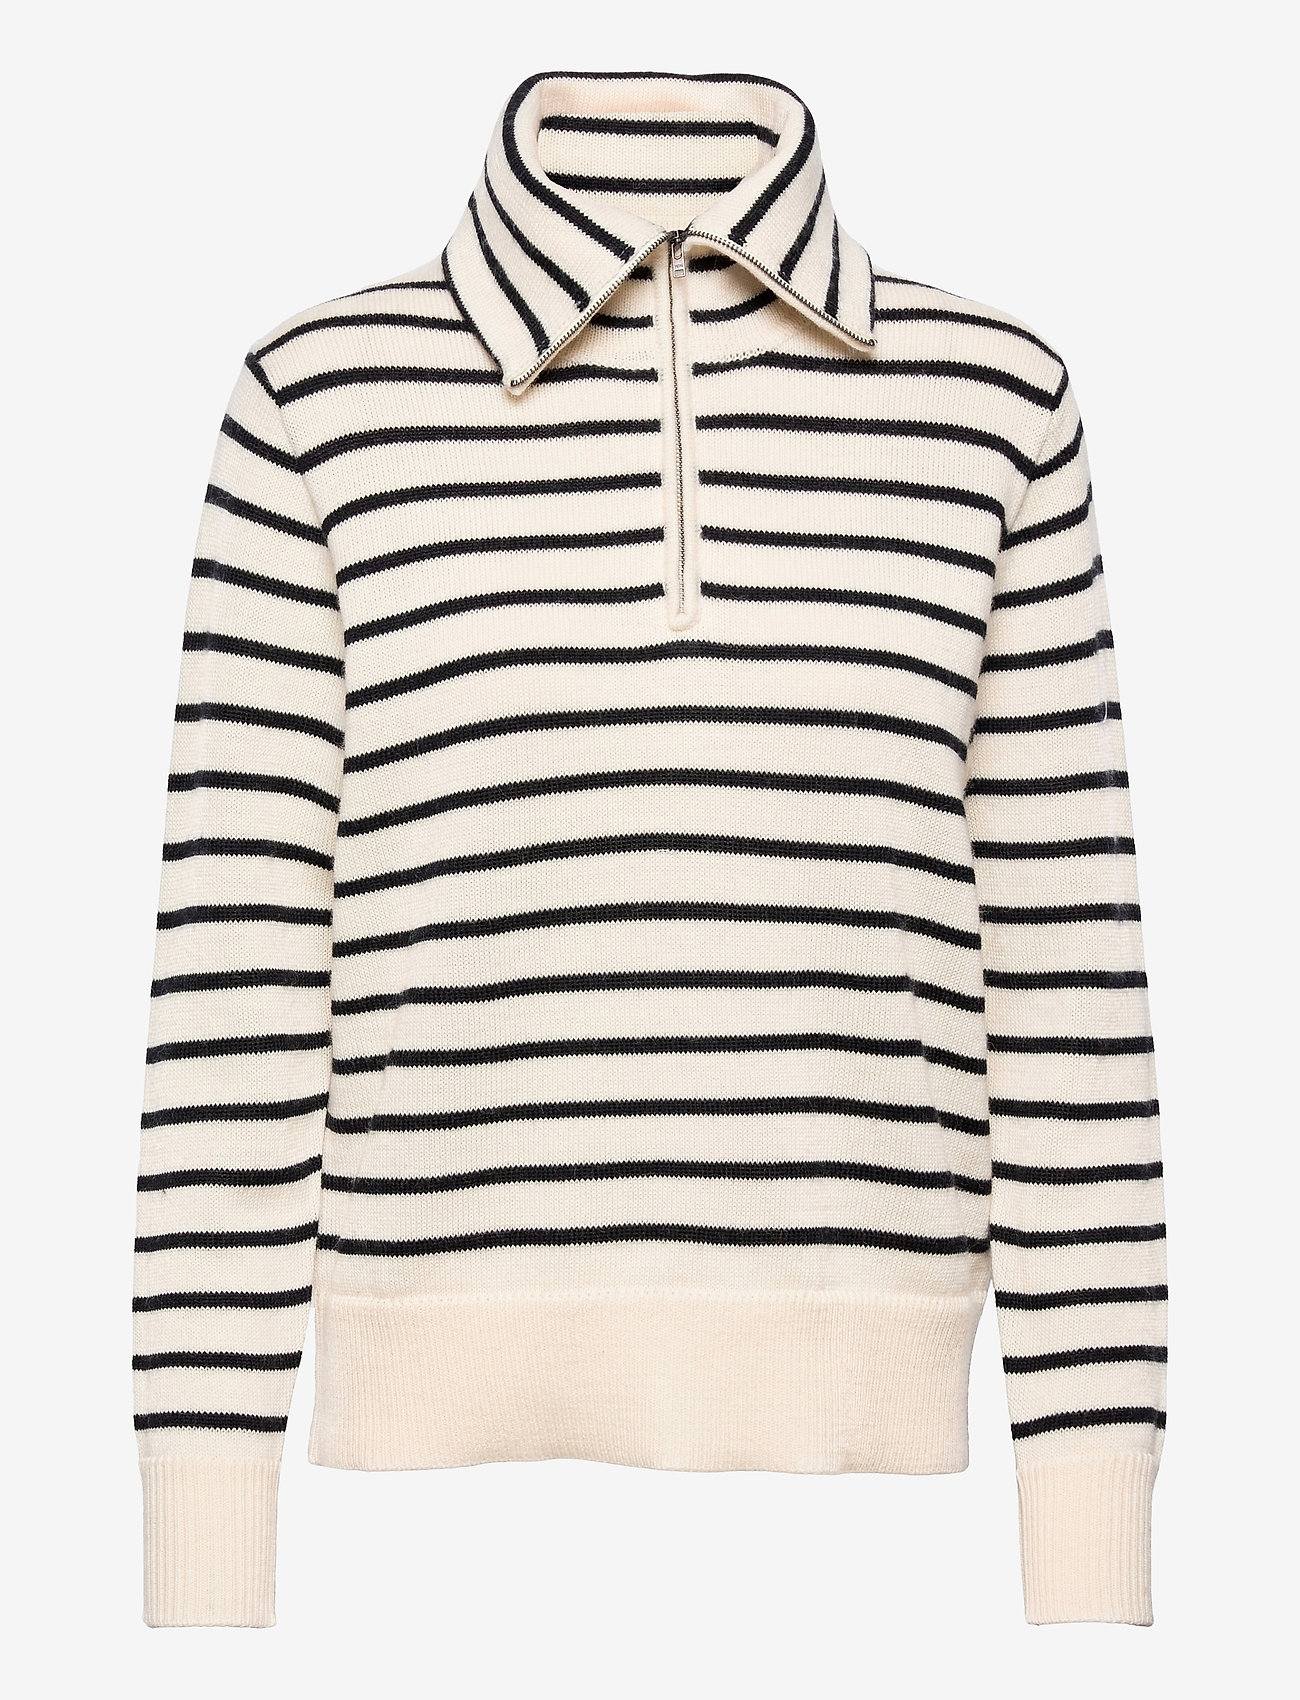 Wood Wood - Clementine classic merino jumper - trøjer - navy/off-white stripes - 0